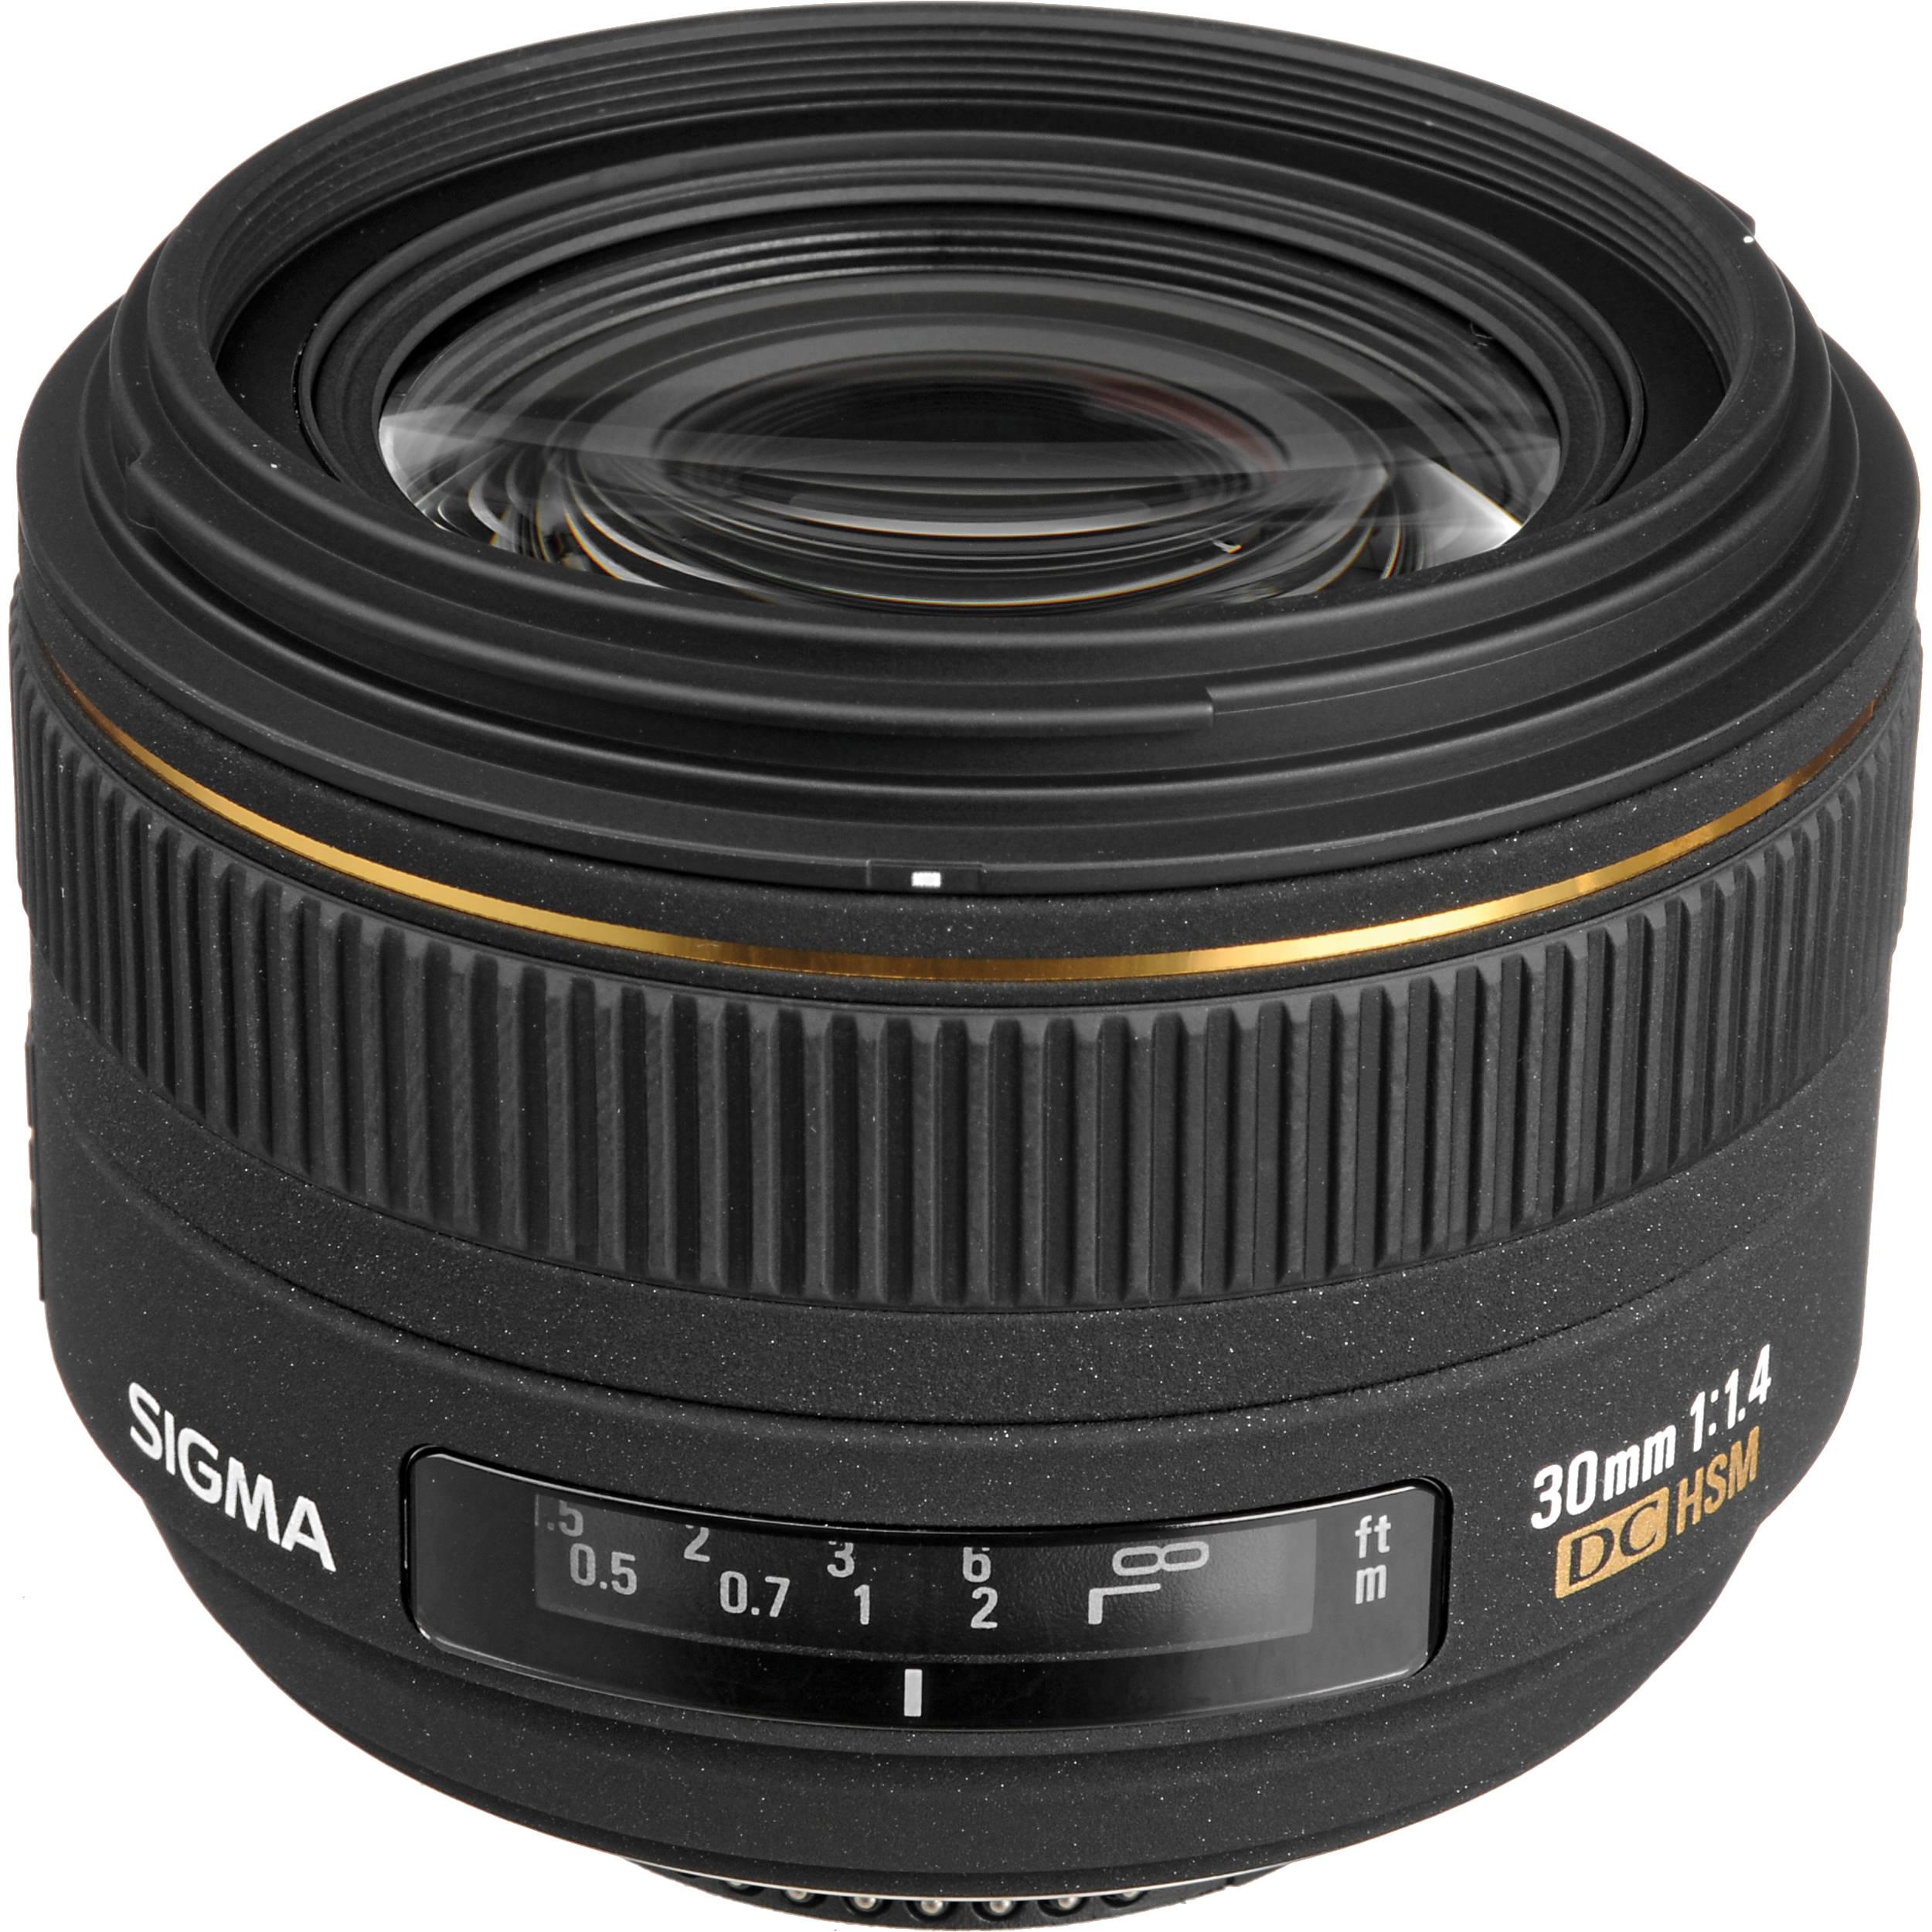 Sigma 30mm f/1.4 EX DC HSM Autofocus Lens for Nikon 300306 B&H